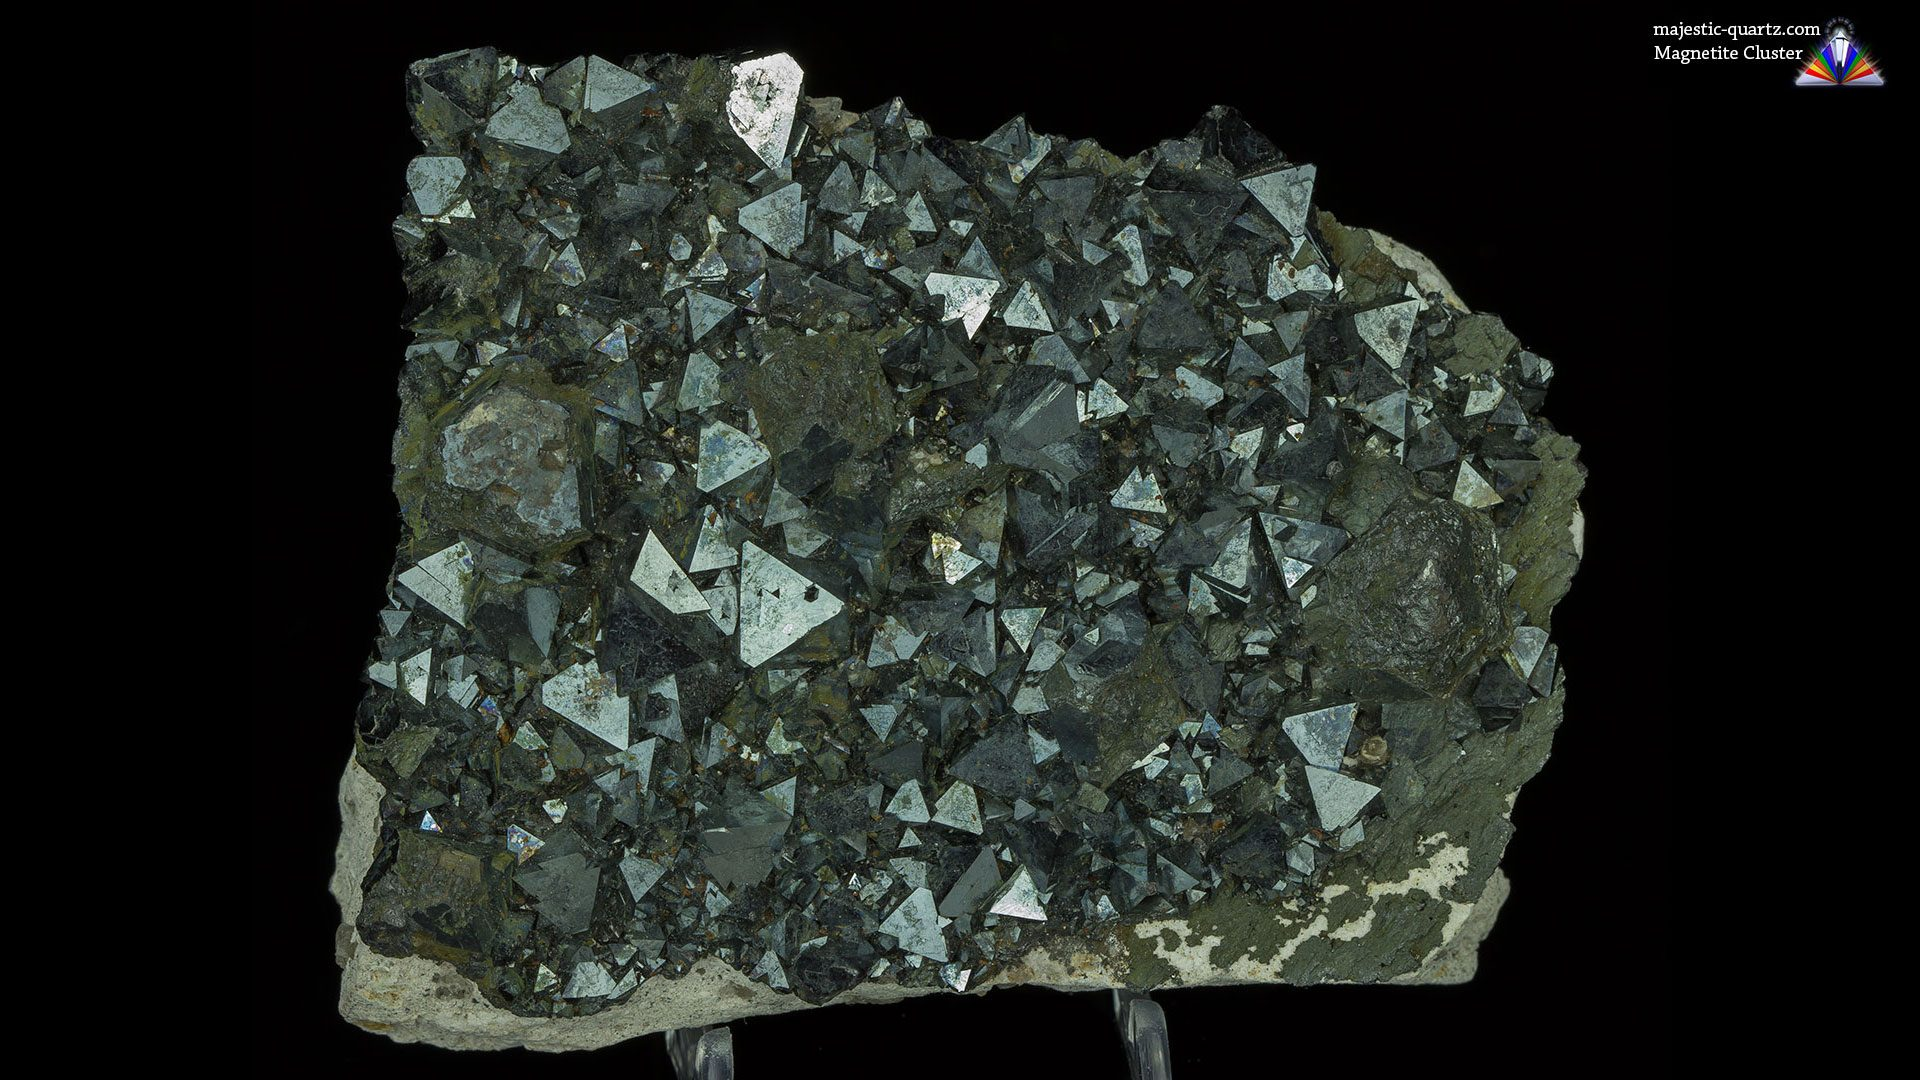 Magnetite Cluster Mineral Specimen - Photo by Anthony Bradford